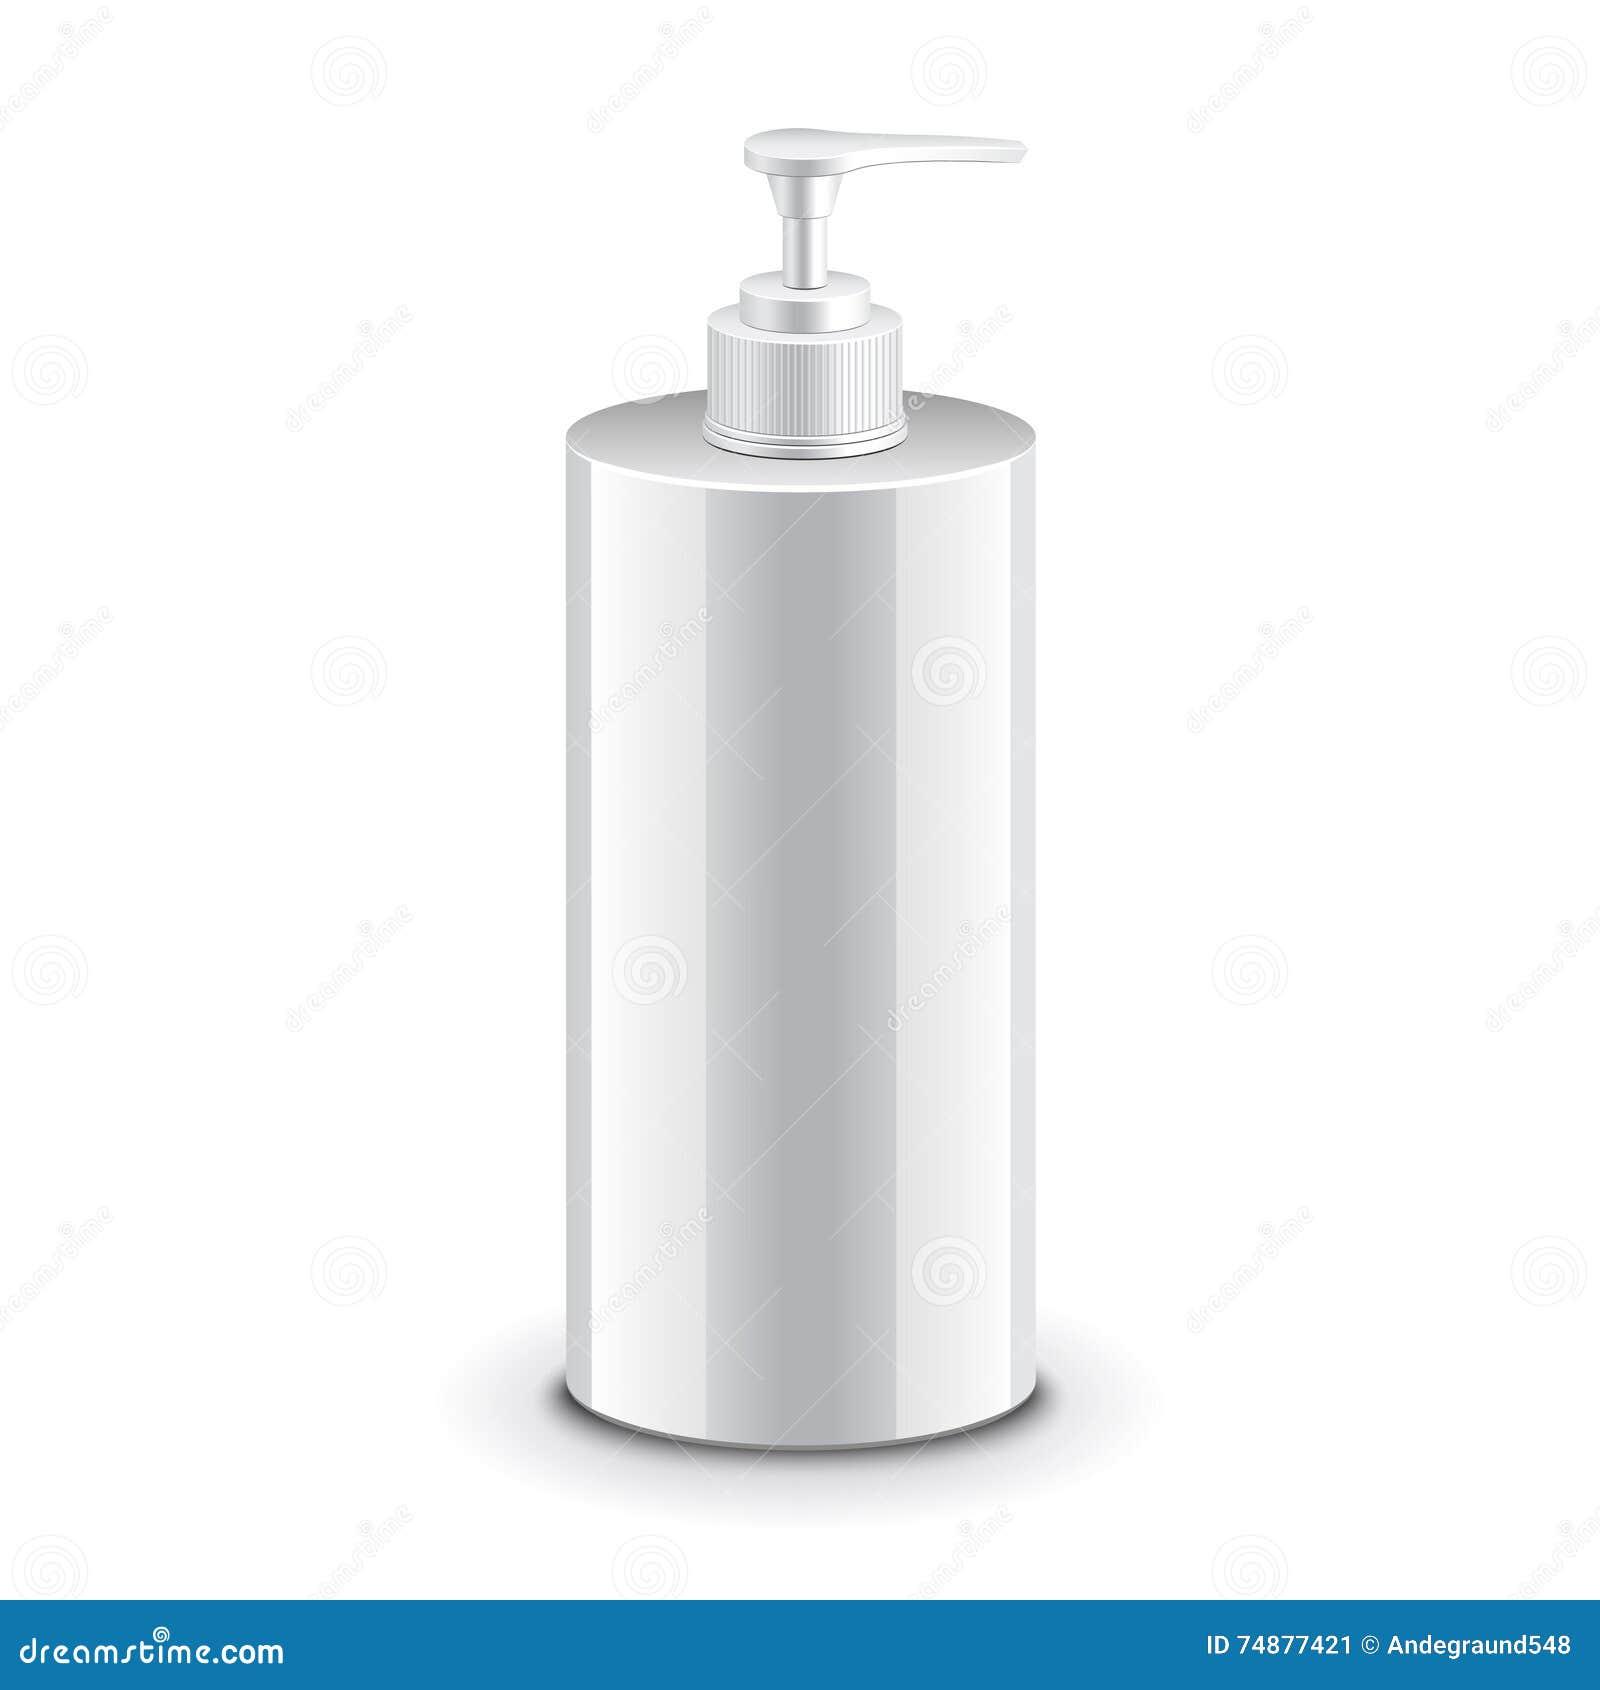 Garrafa plástica cosmética com bomba do distribuidor